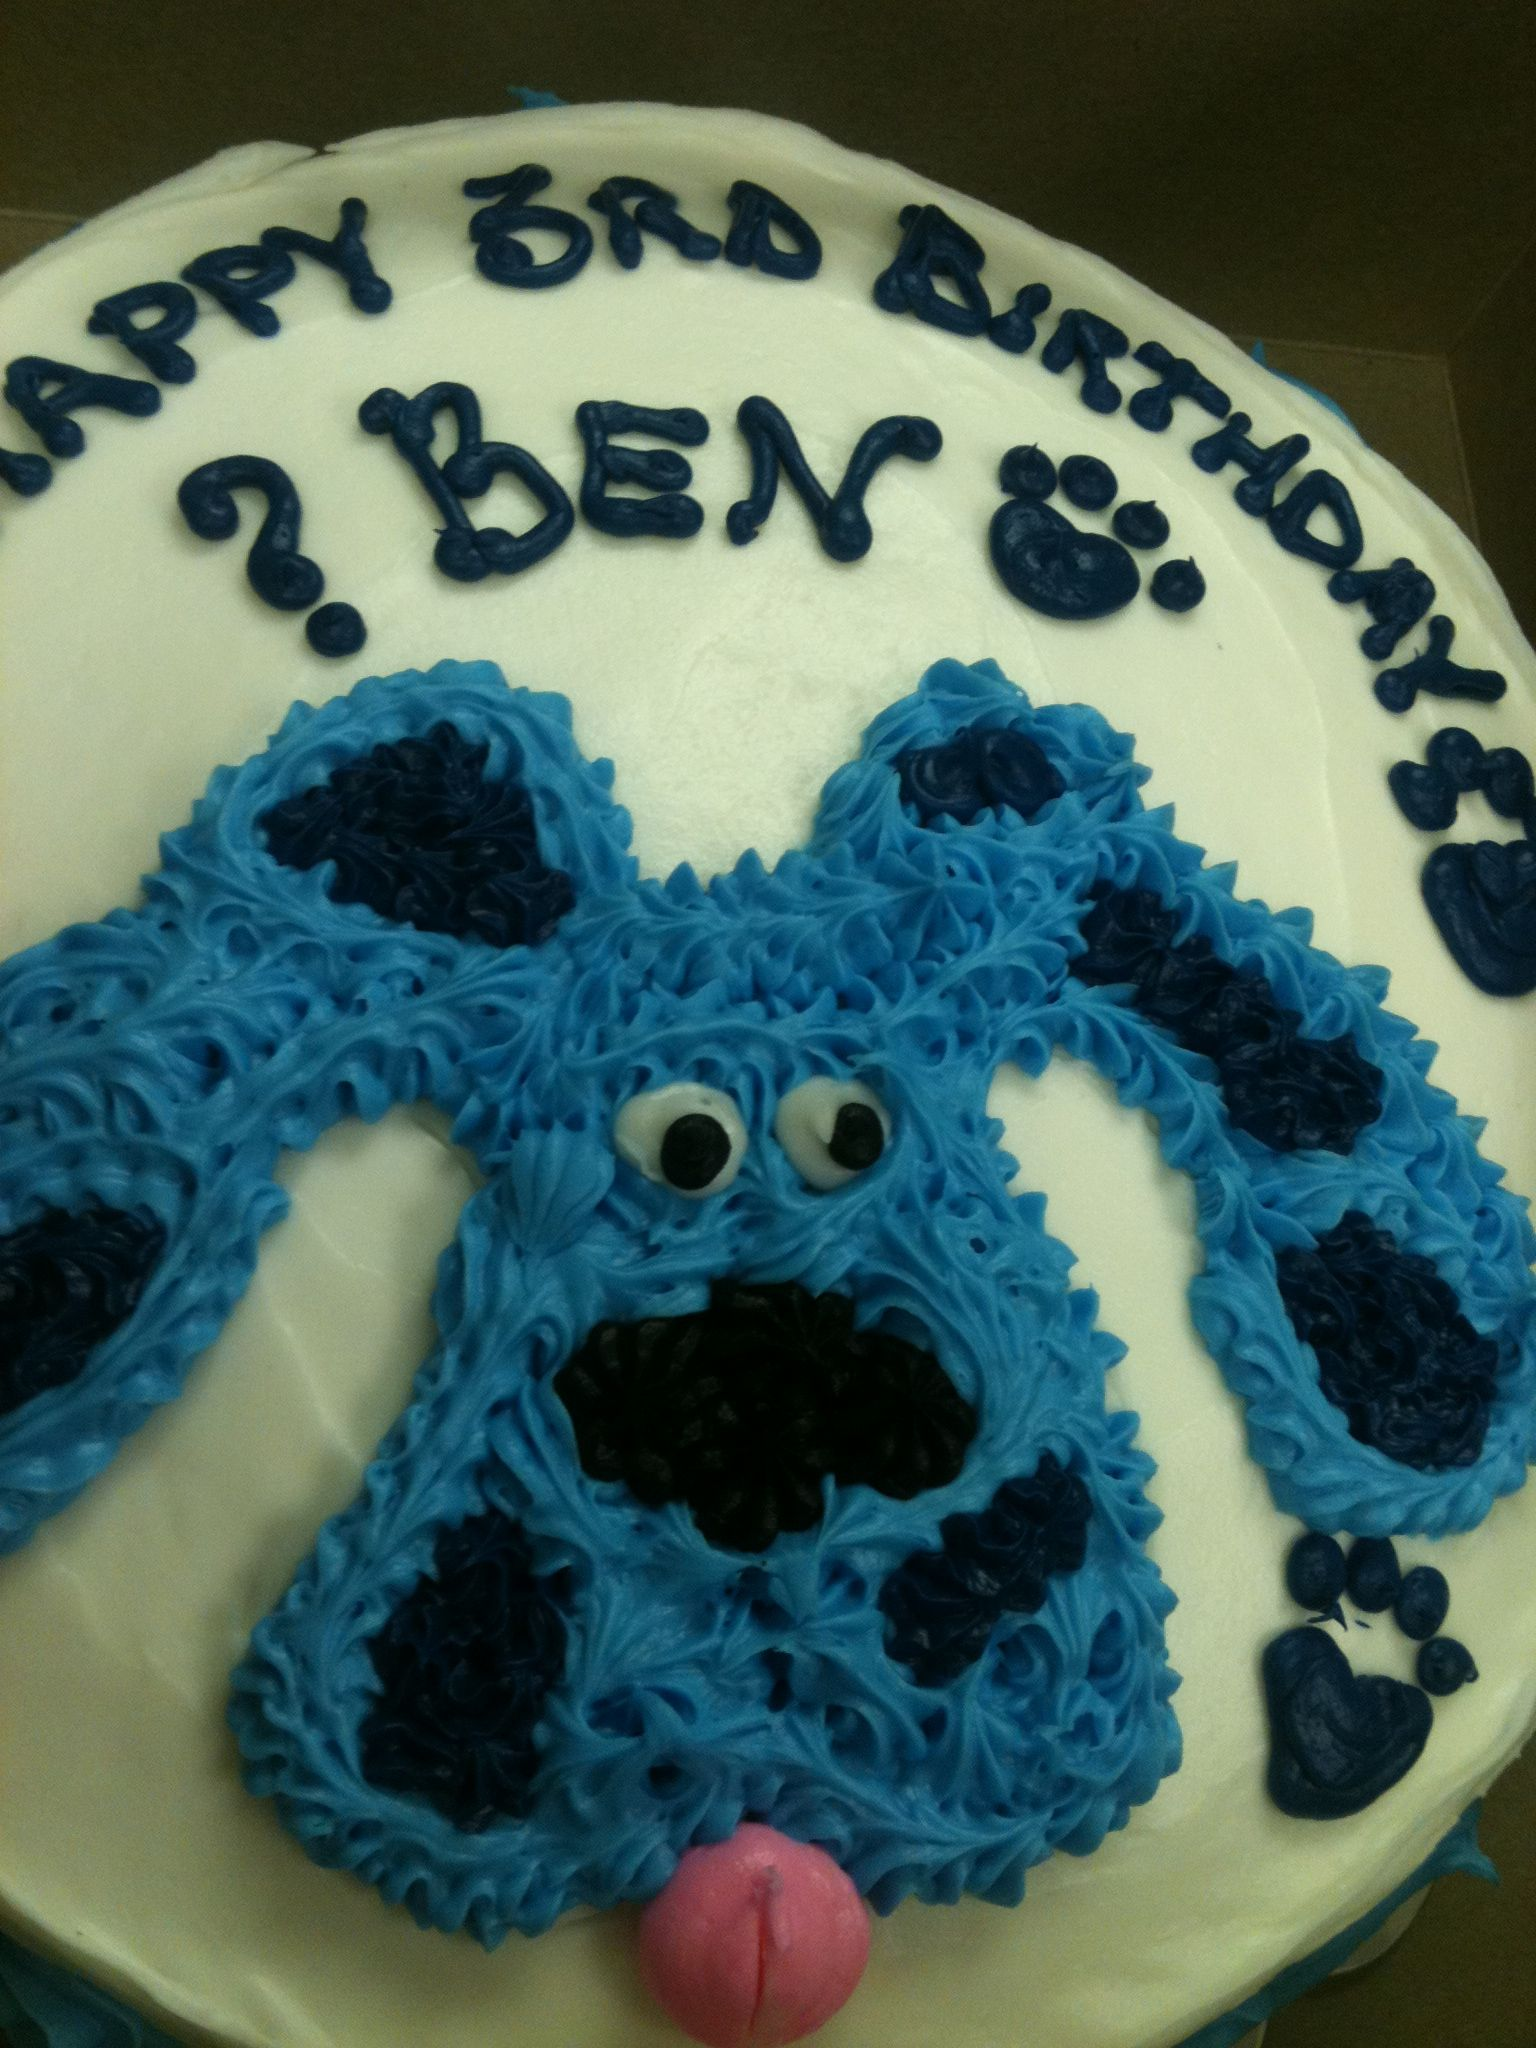 48+ Blues clues cake smash ideas